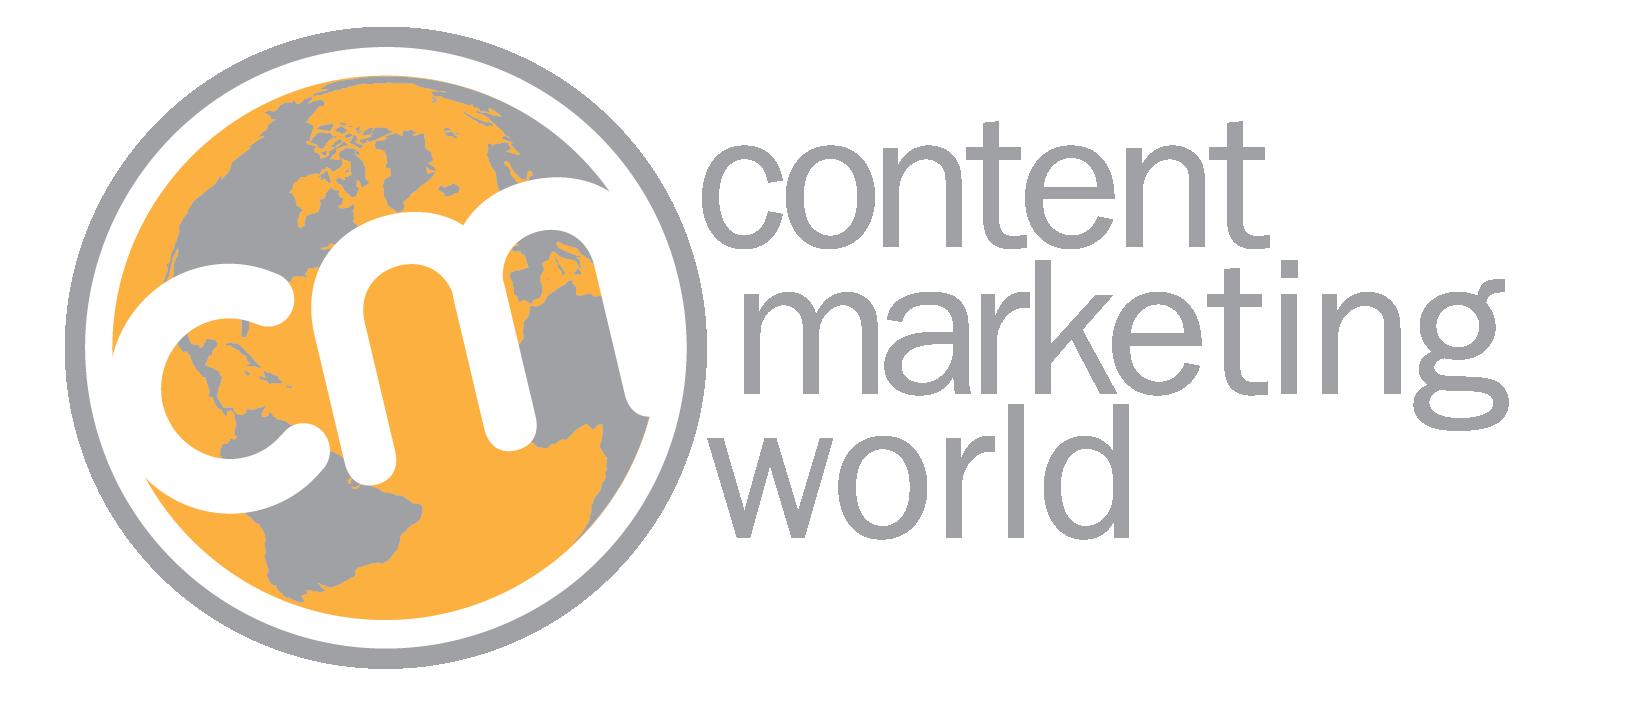 Content Marketing World OH 2018